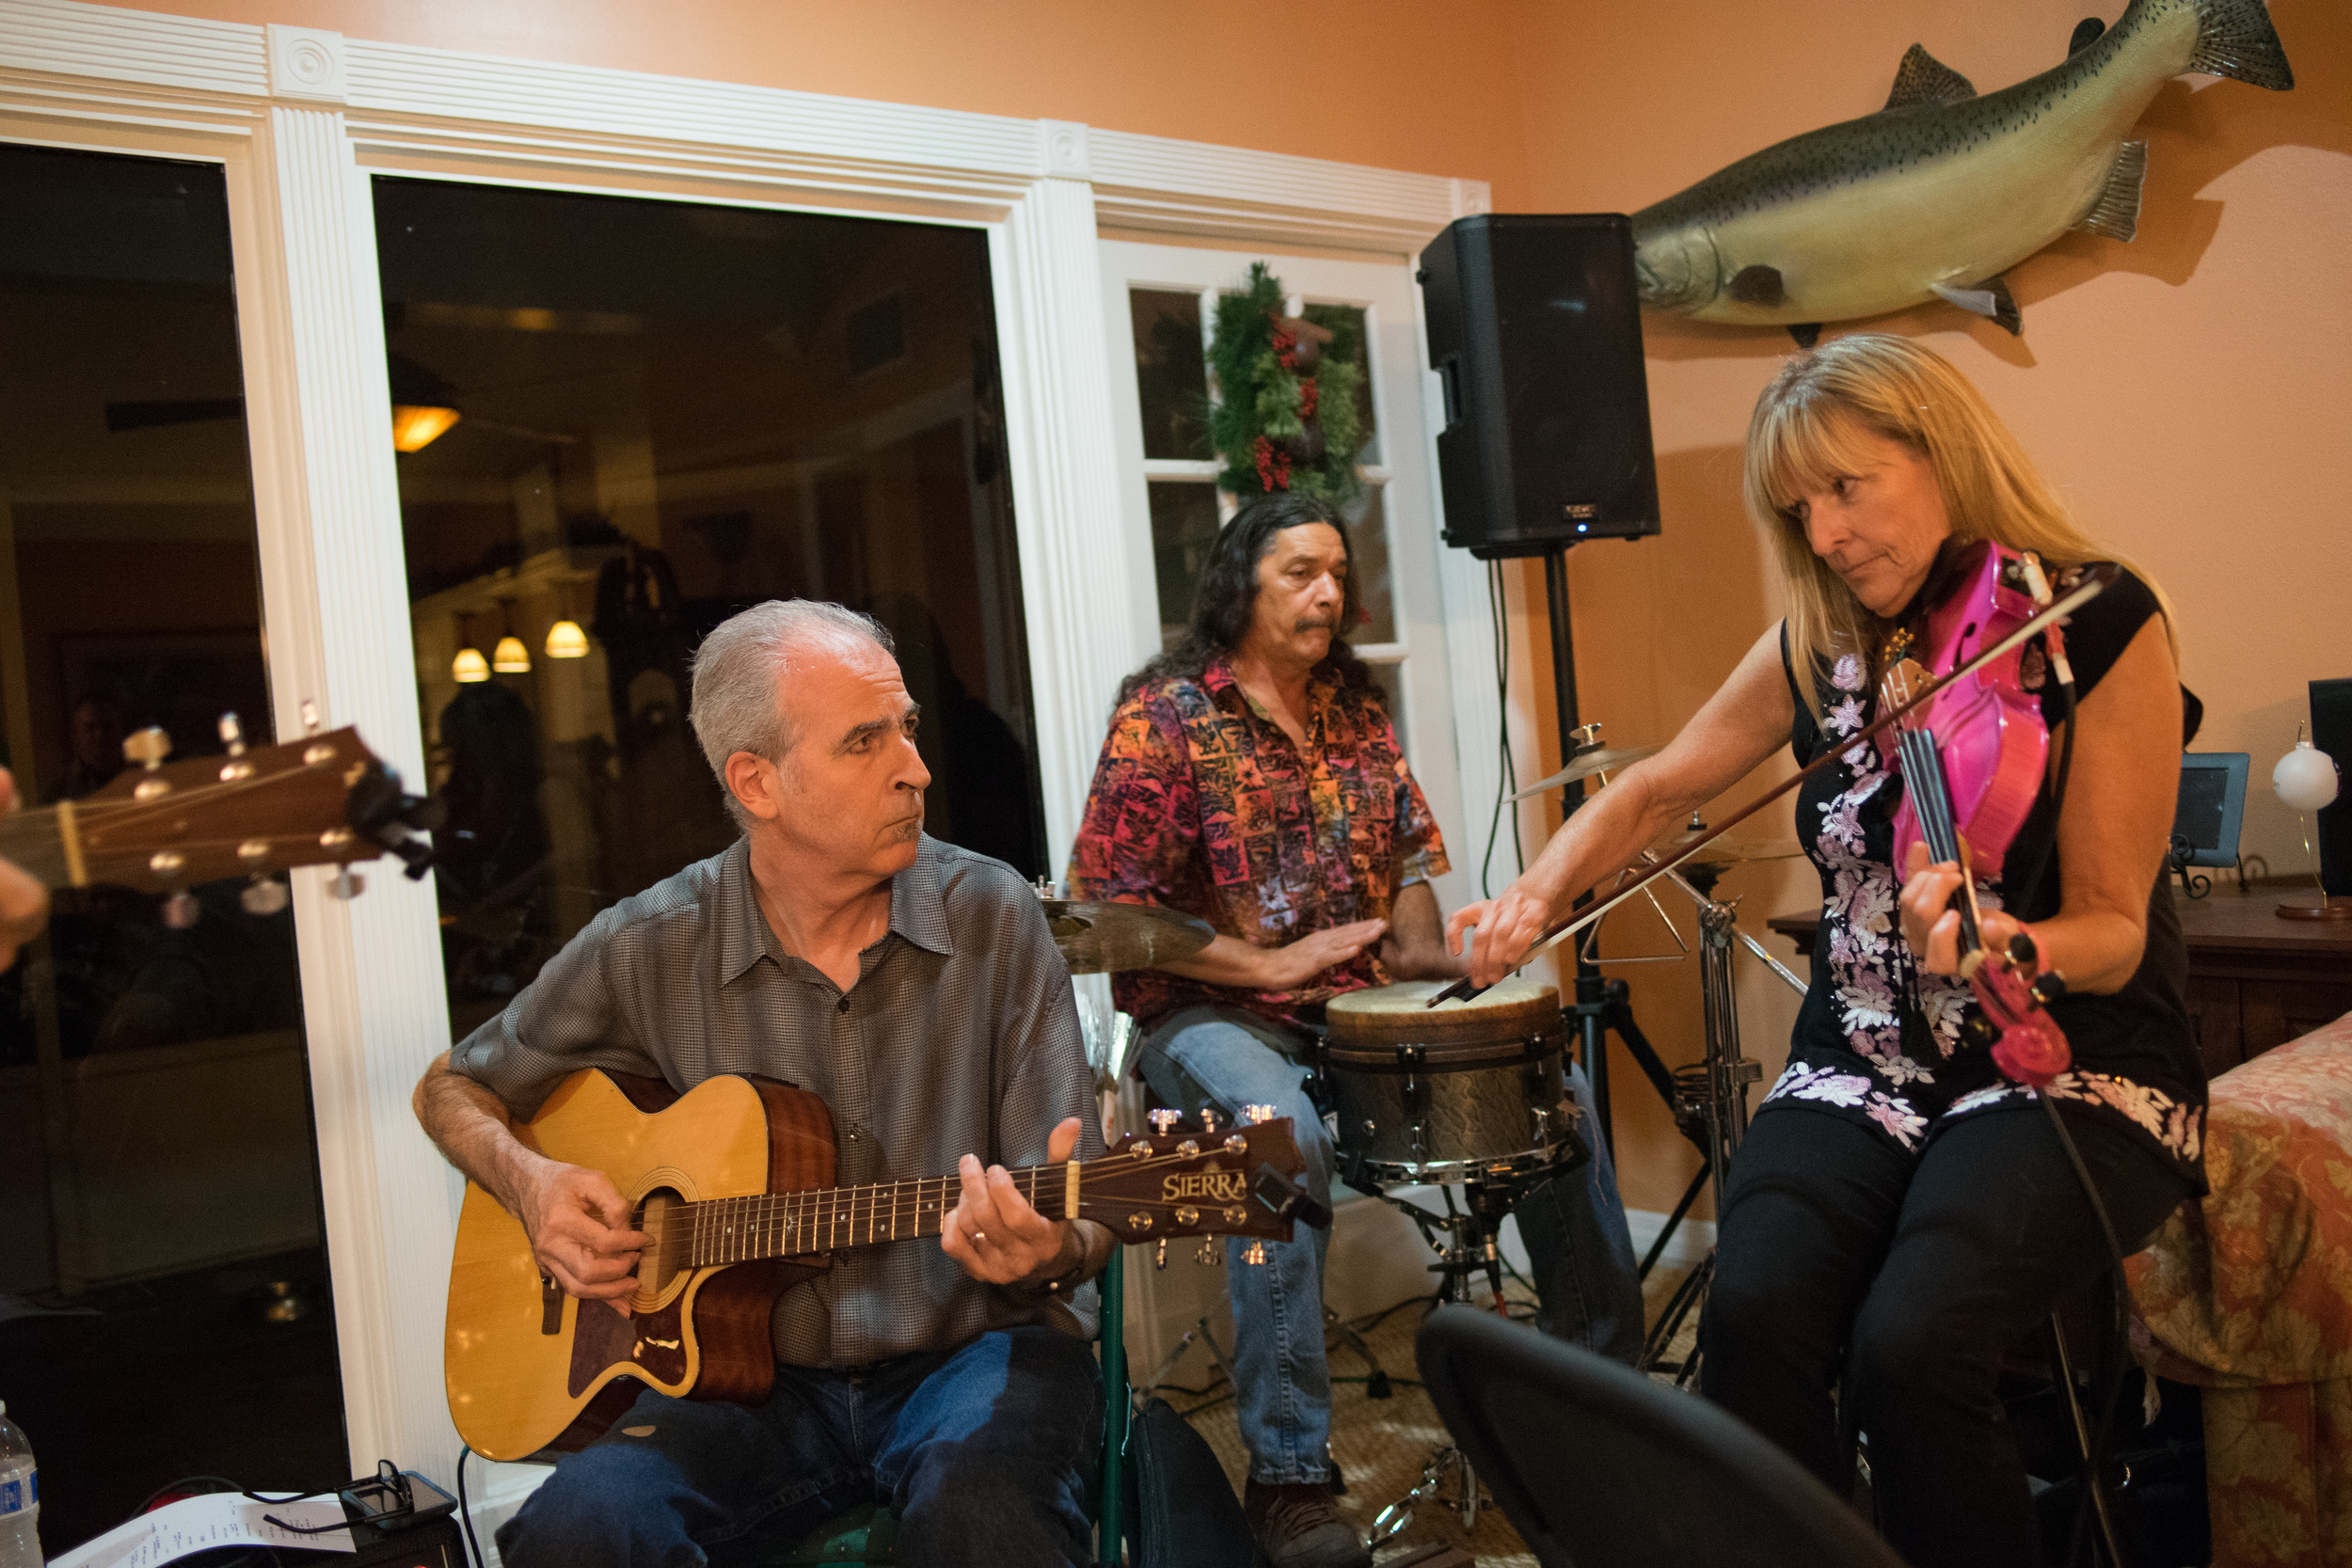 Douglas, Bill and Amanda at St. Petersburg, FL House Concert December 12, 2015 , photo credit: Mitchel Frick